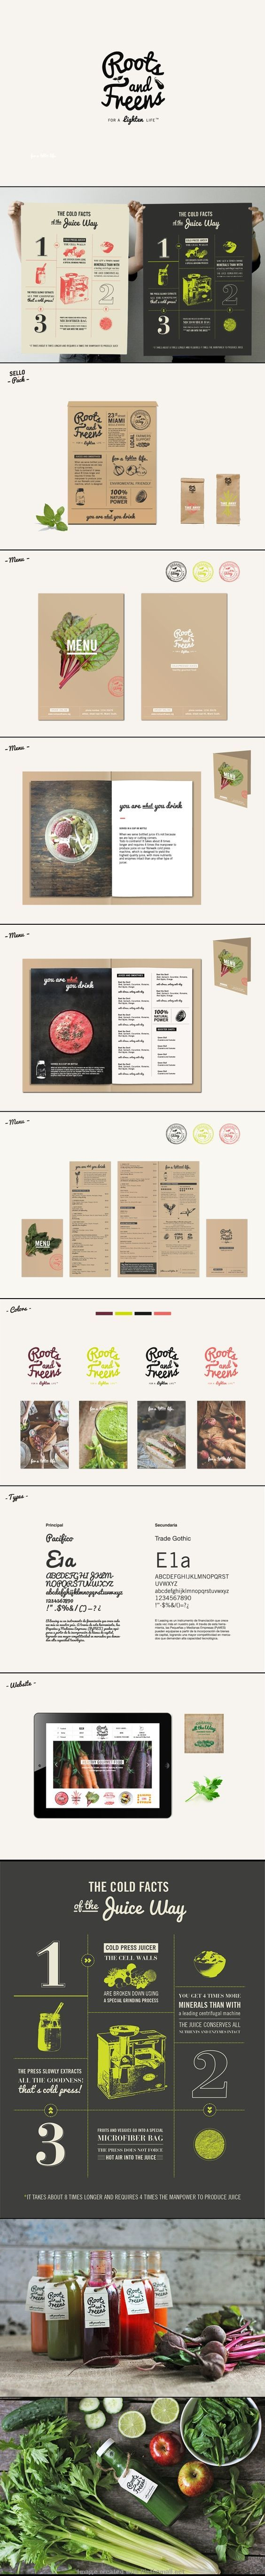 Roots and Ferns Branding on Behance | Fivestar Branding – Design and Branding Agency & Inspiration Gallery